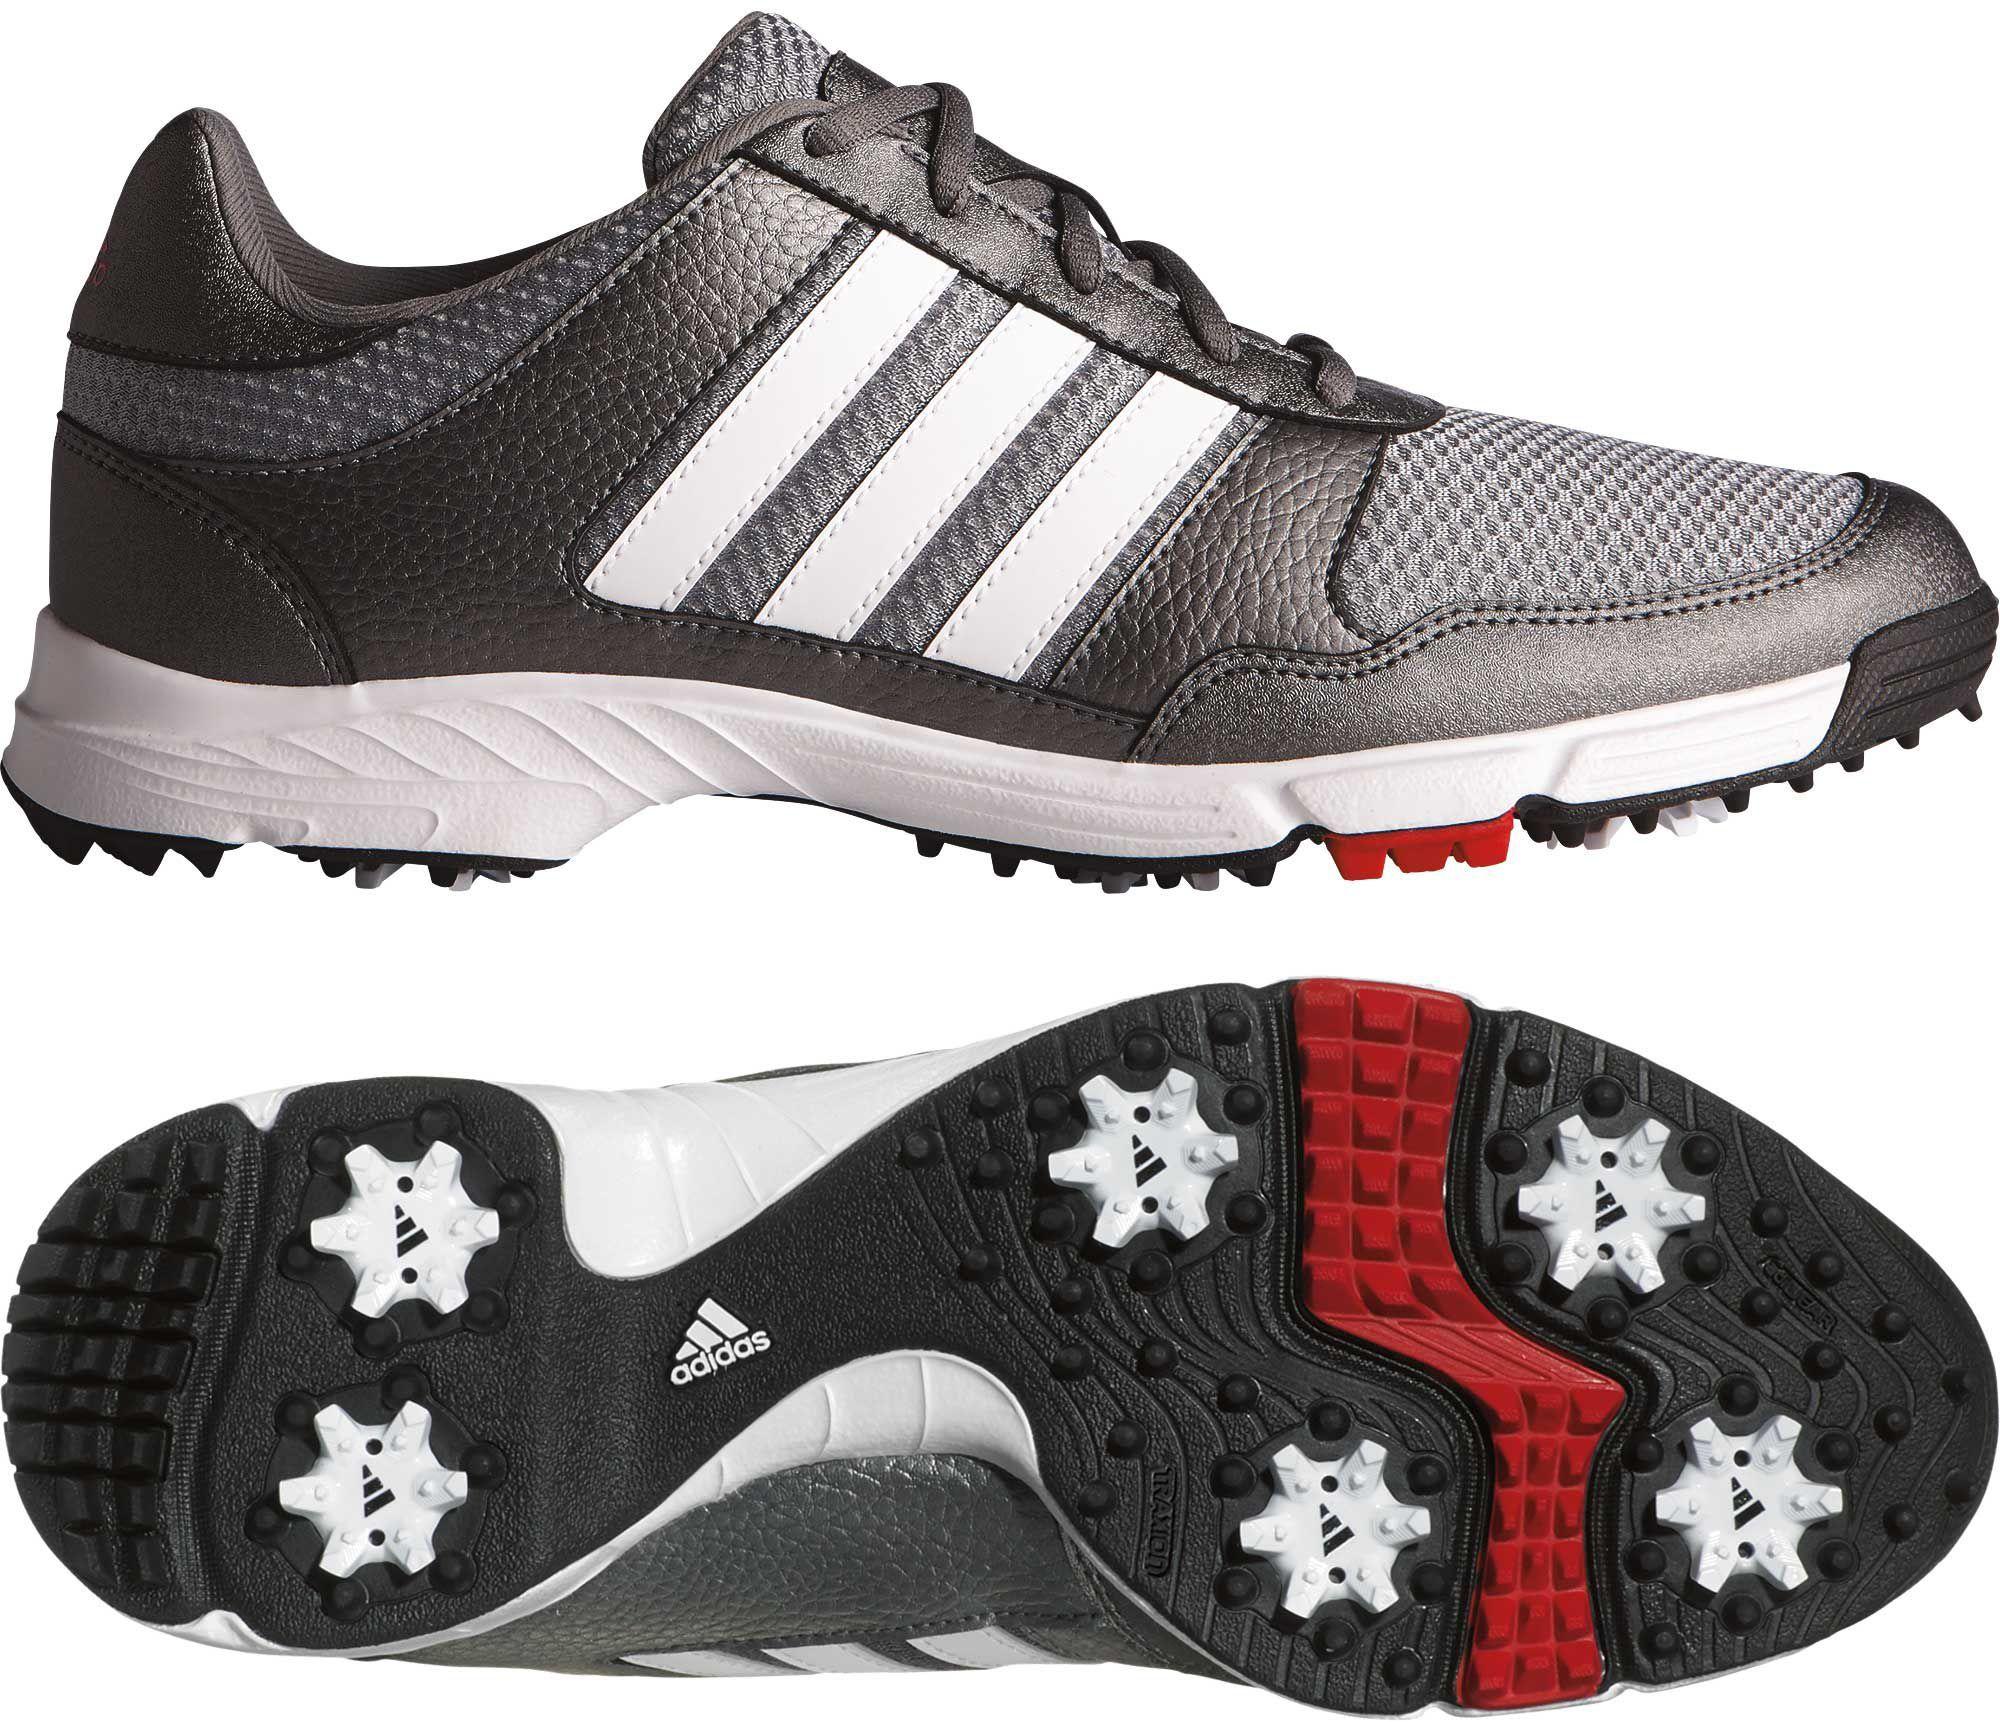 quality design b588b bda8b adidas Tech Response Golf Shoes, Mens, Size 10.0, Gray